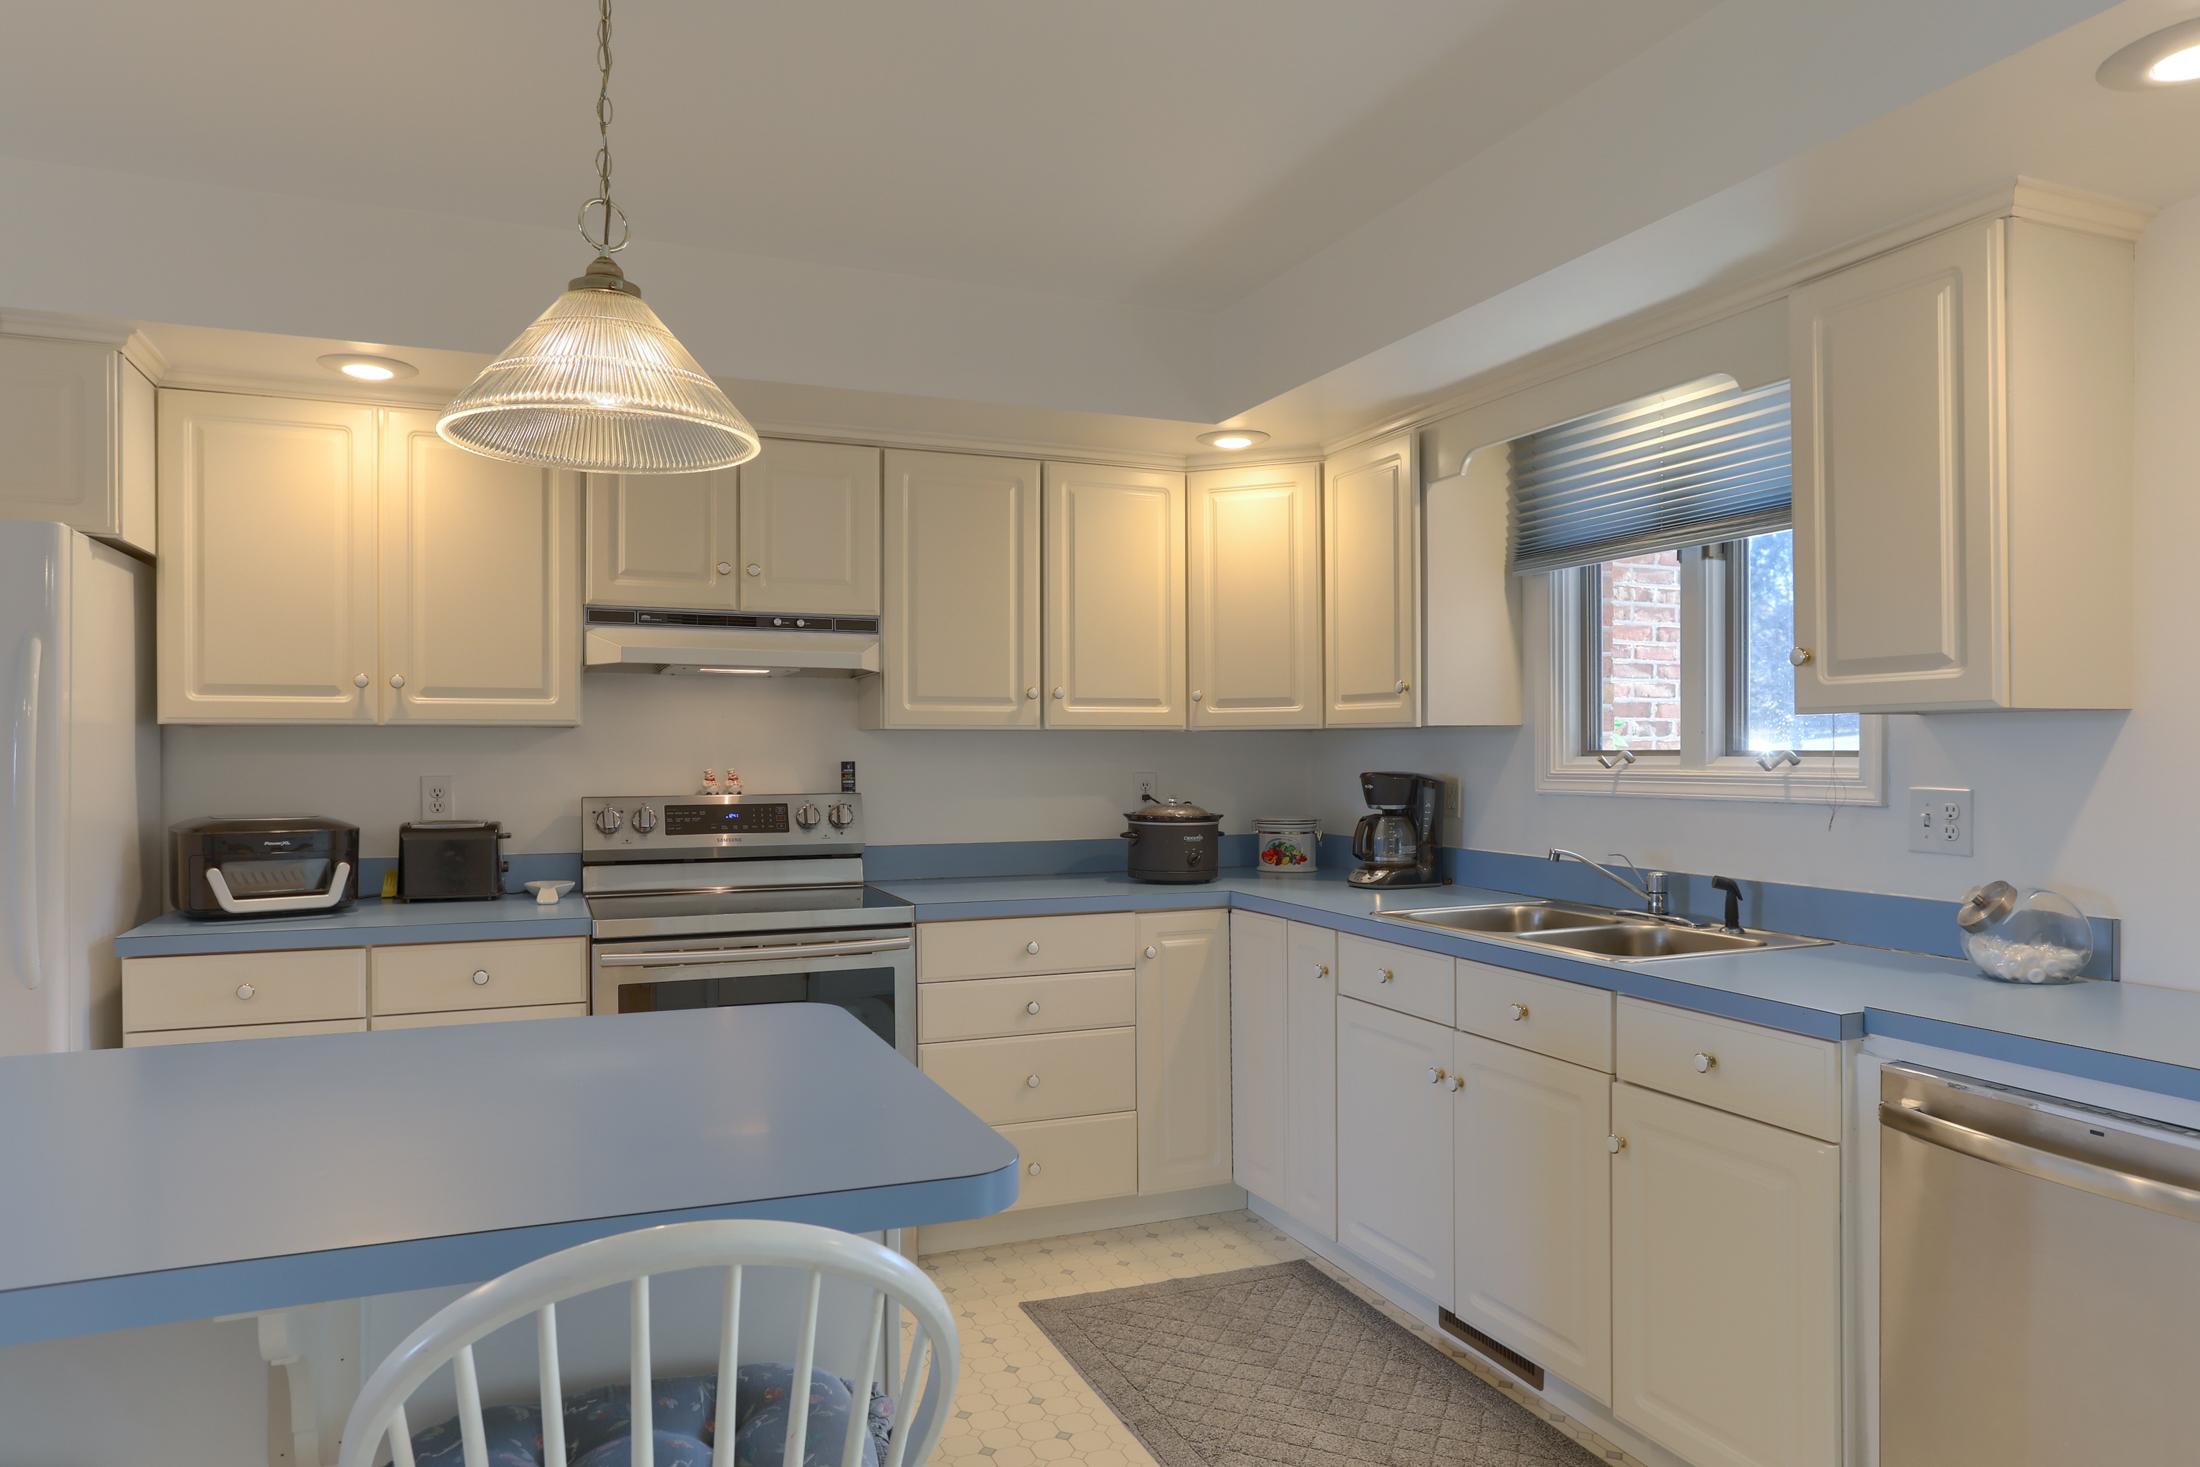 26 W. Strack Drive - Large Kitchen